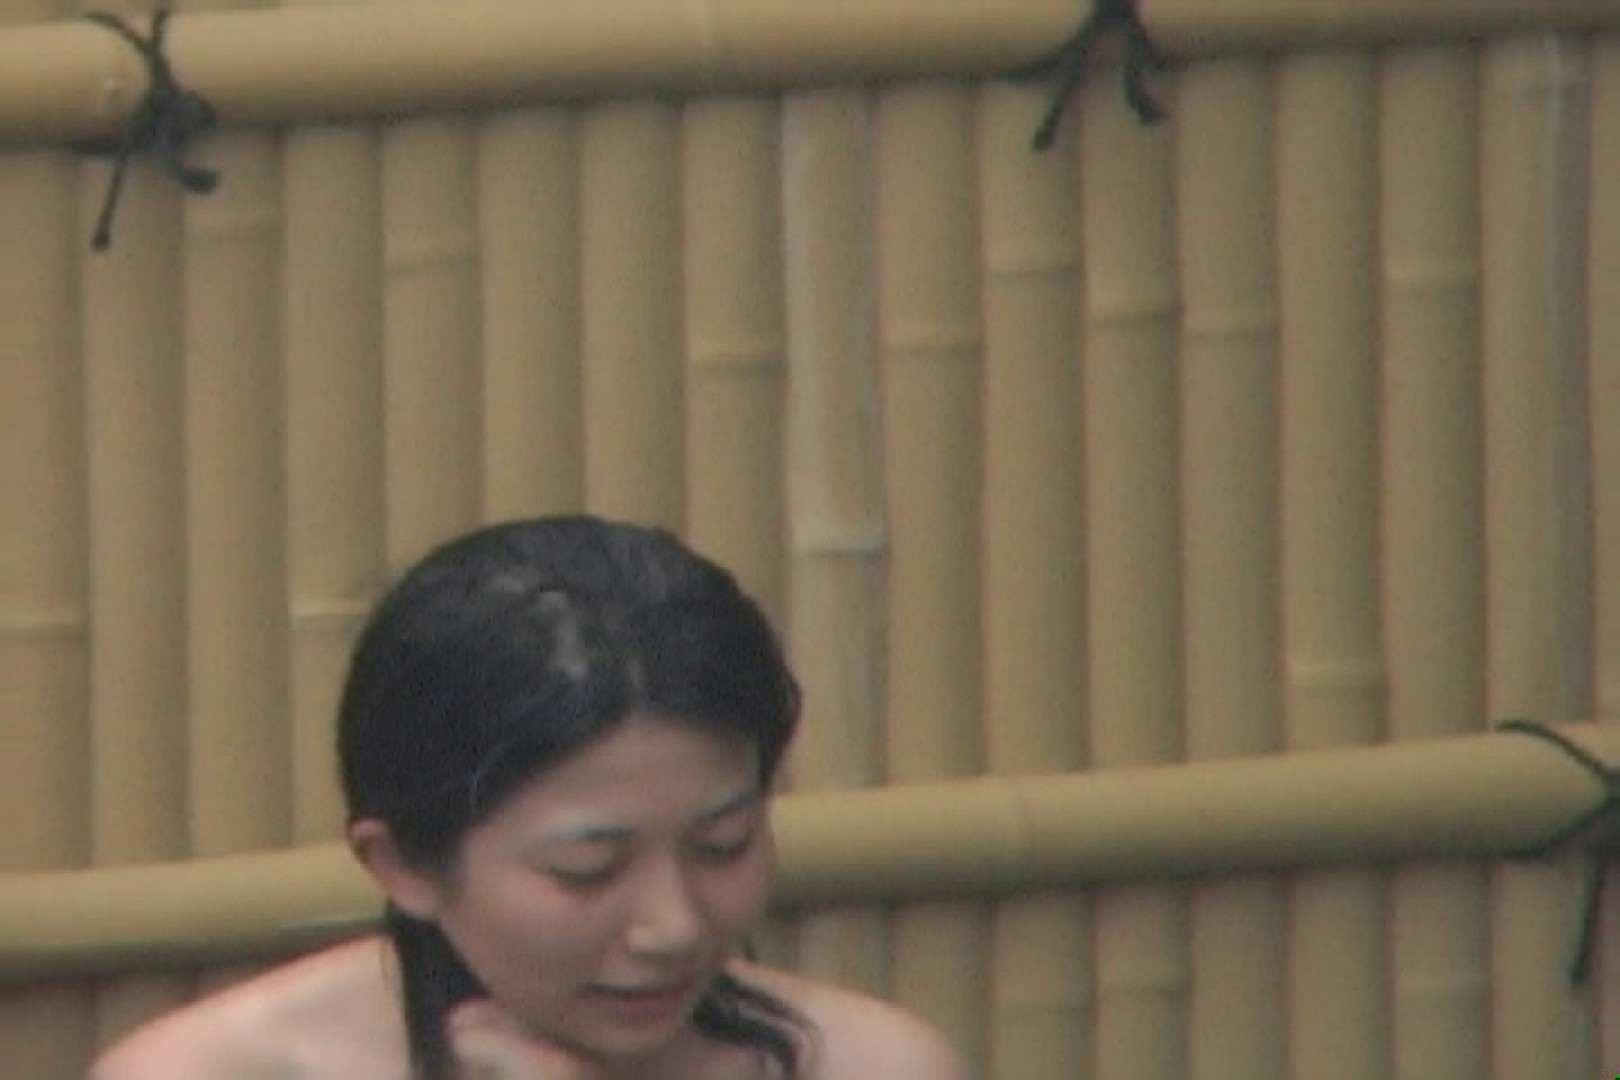 Aquaな露天風呂Vol.43【VIP限定】 露天 のぞき動画画像 88画像 74